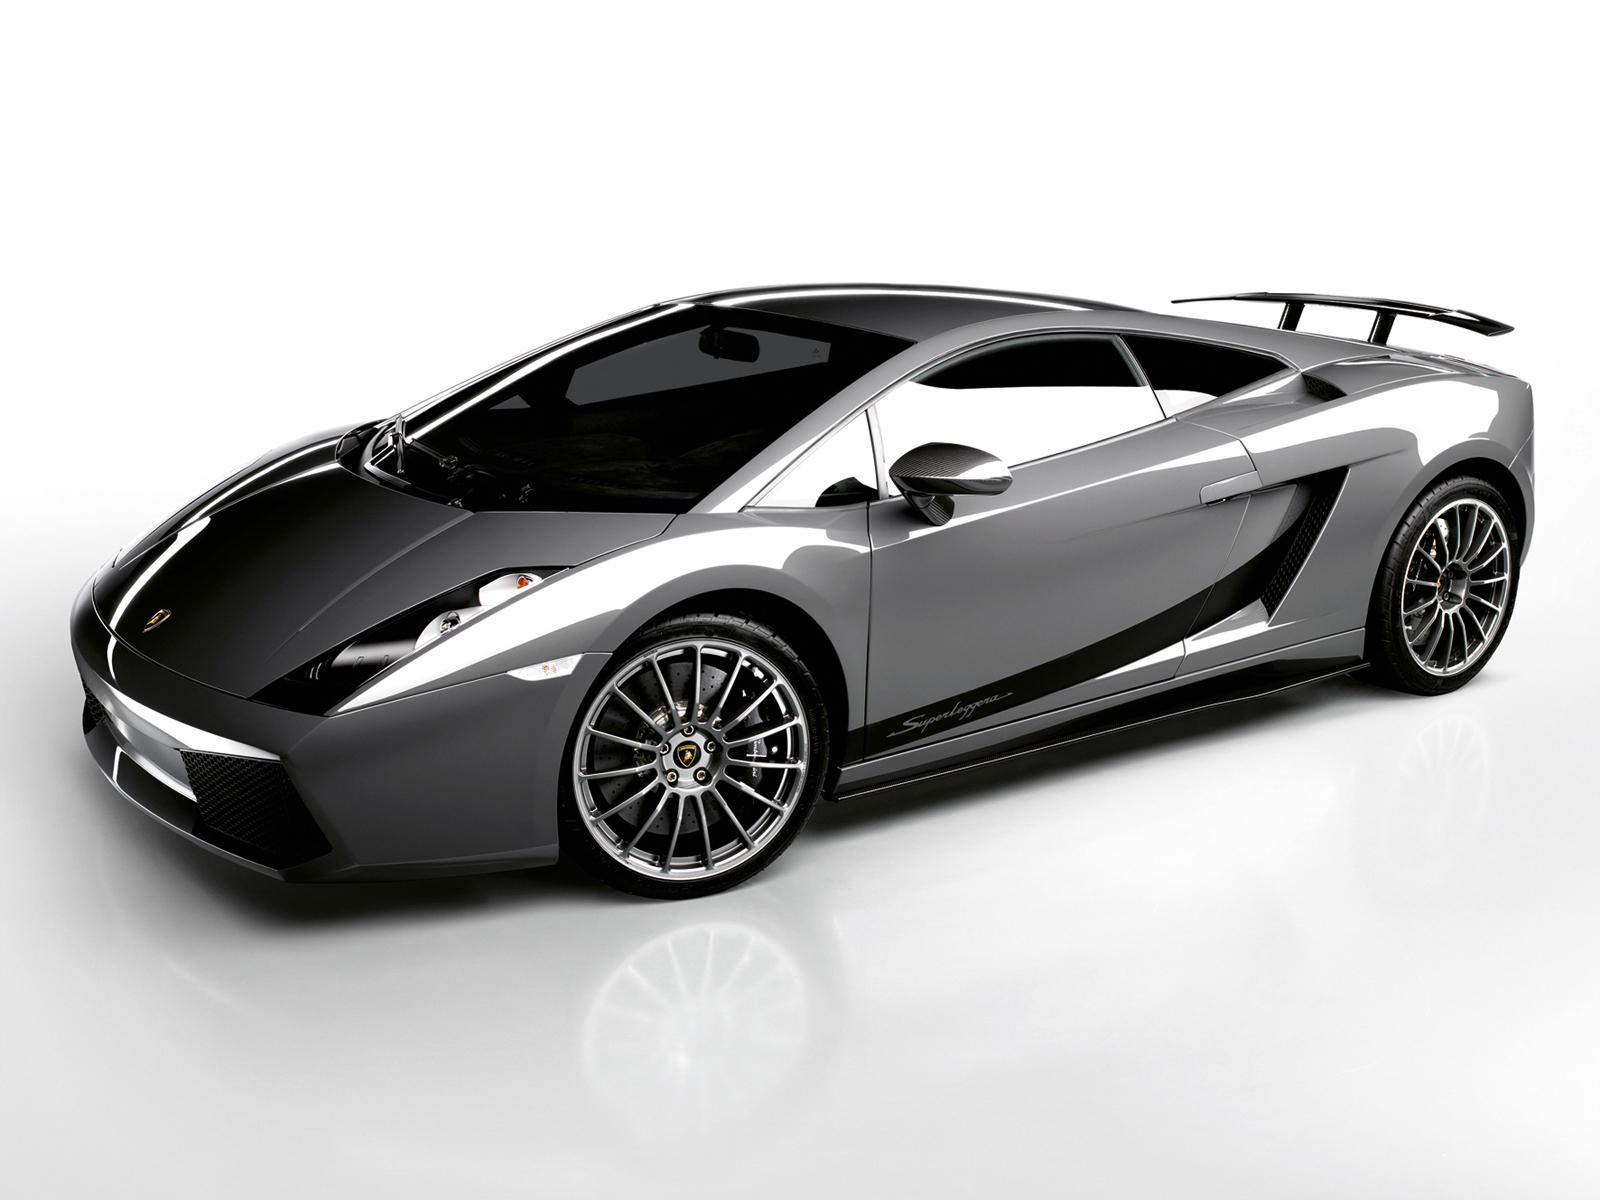 Gtspirit S Top 10 Lamborghini Gallardo Variants Special Editions